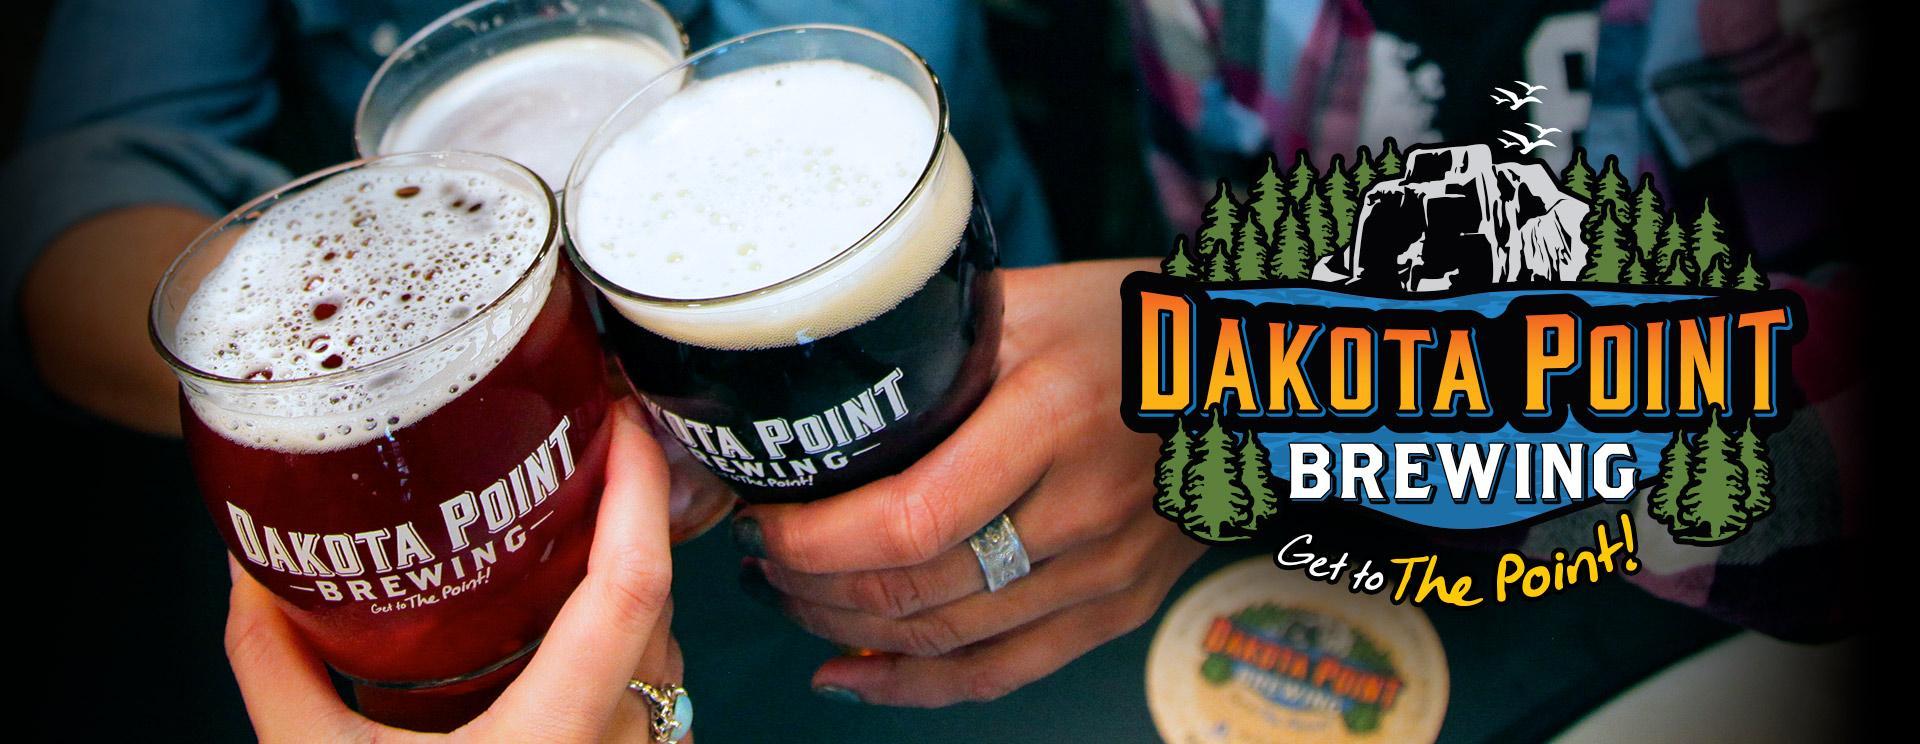 Dakota Point Brewing